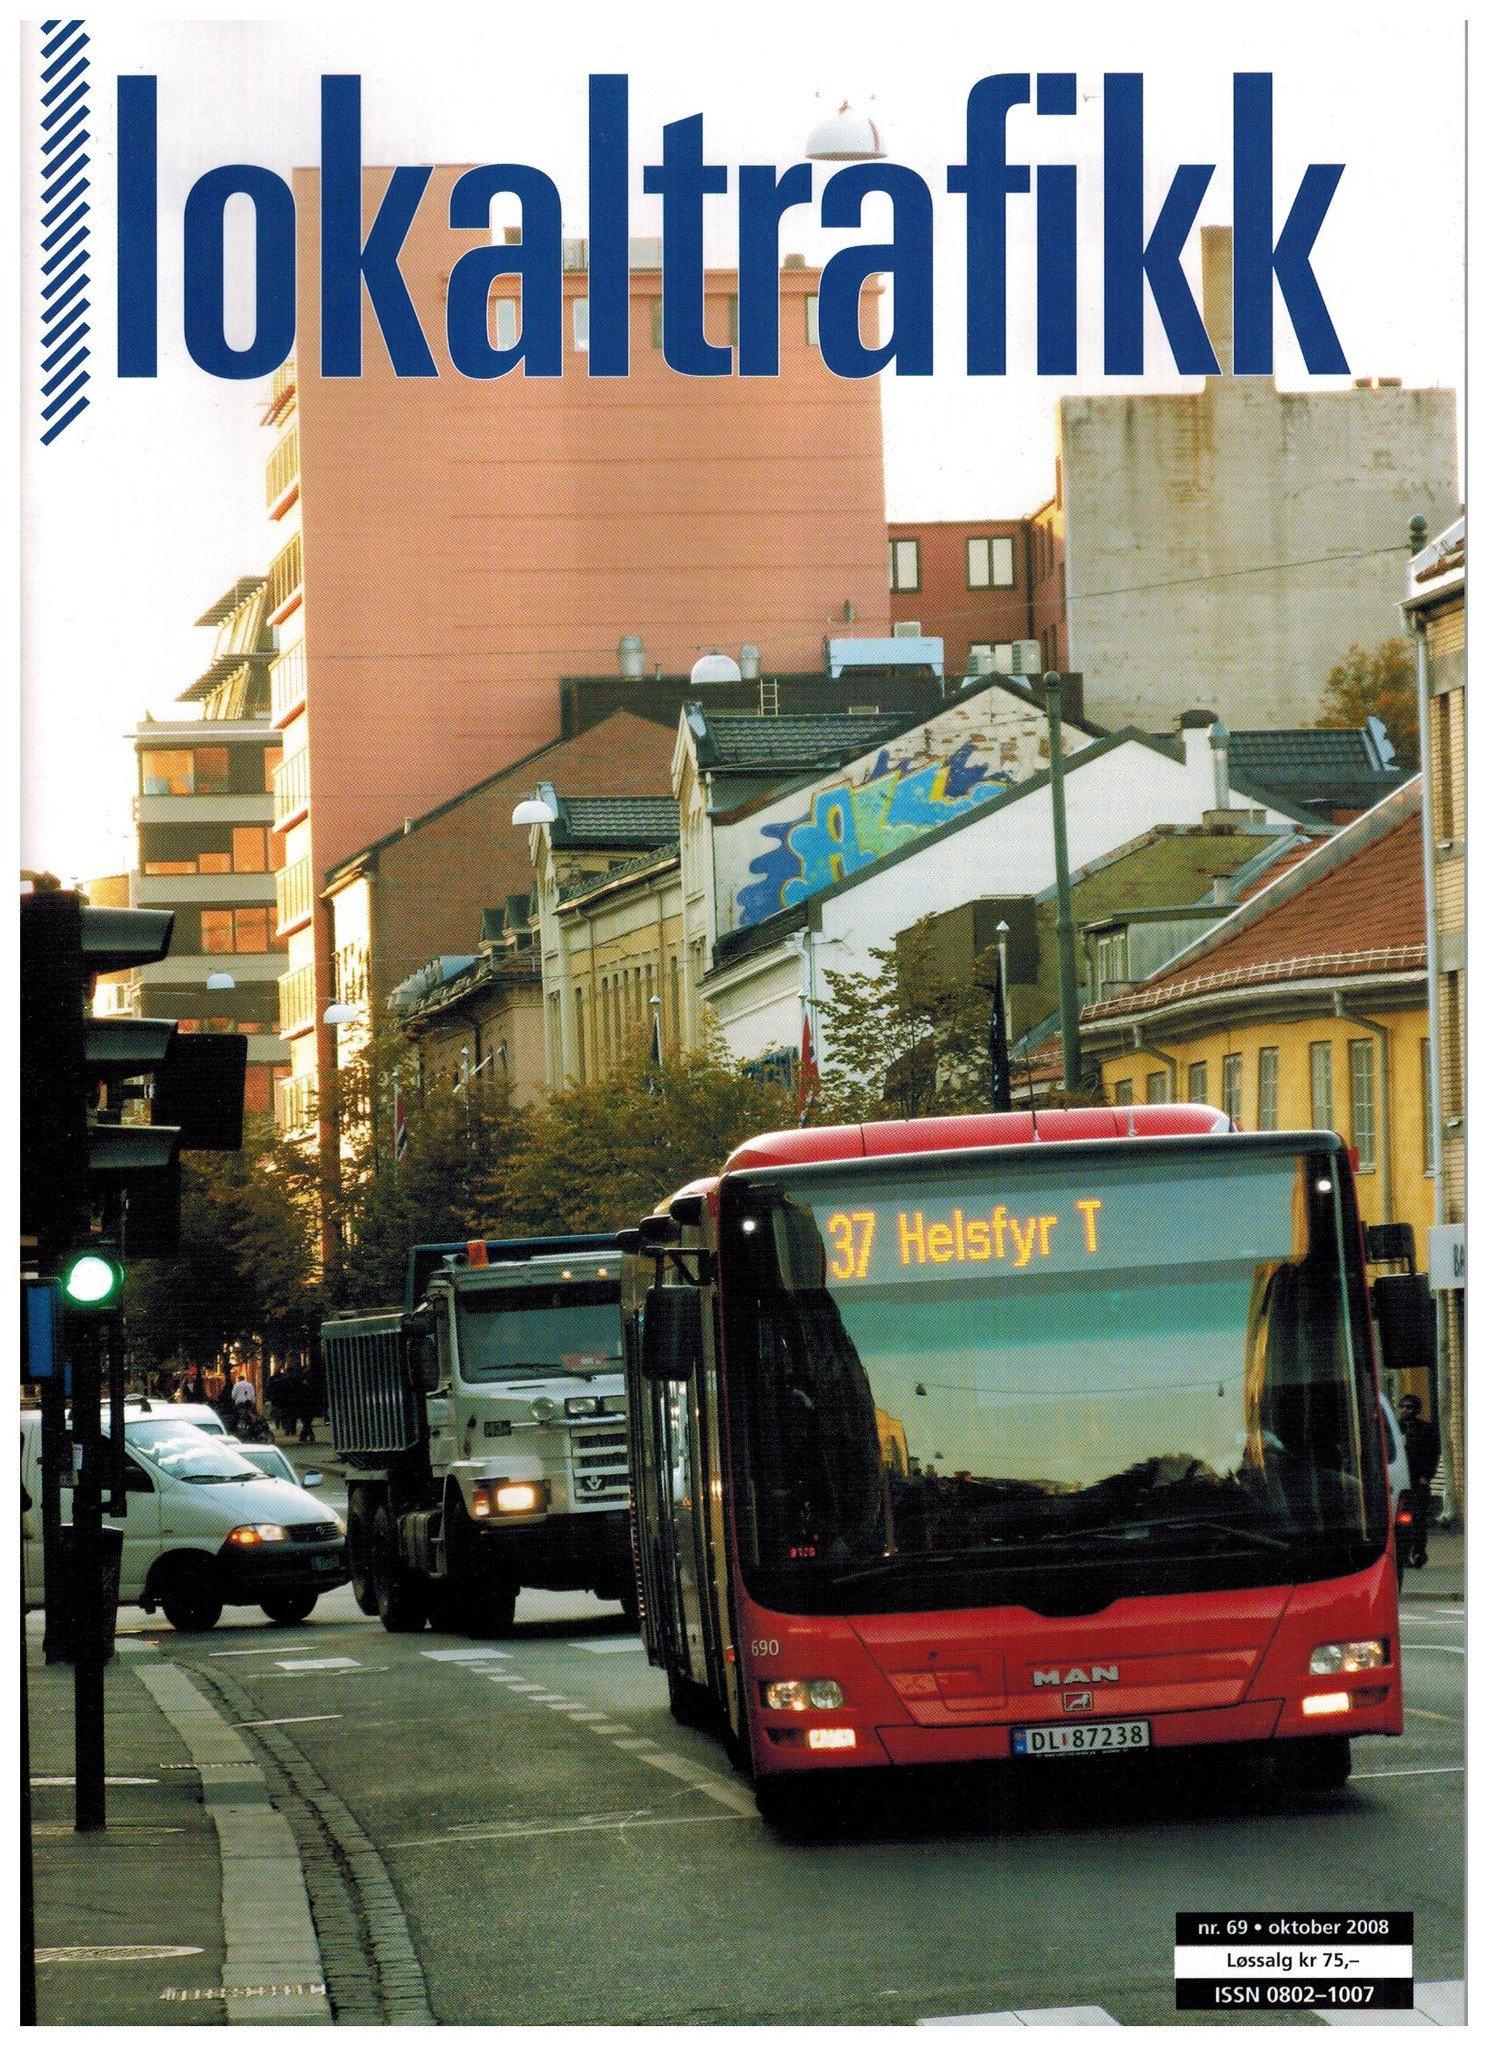 Lokaltrafikk #069